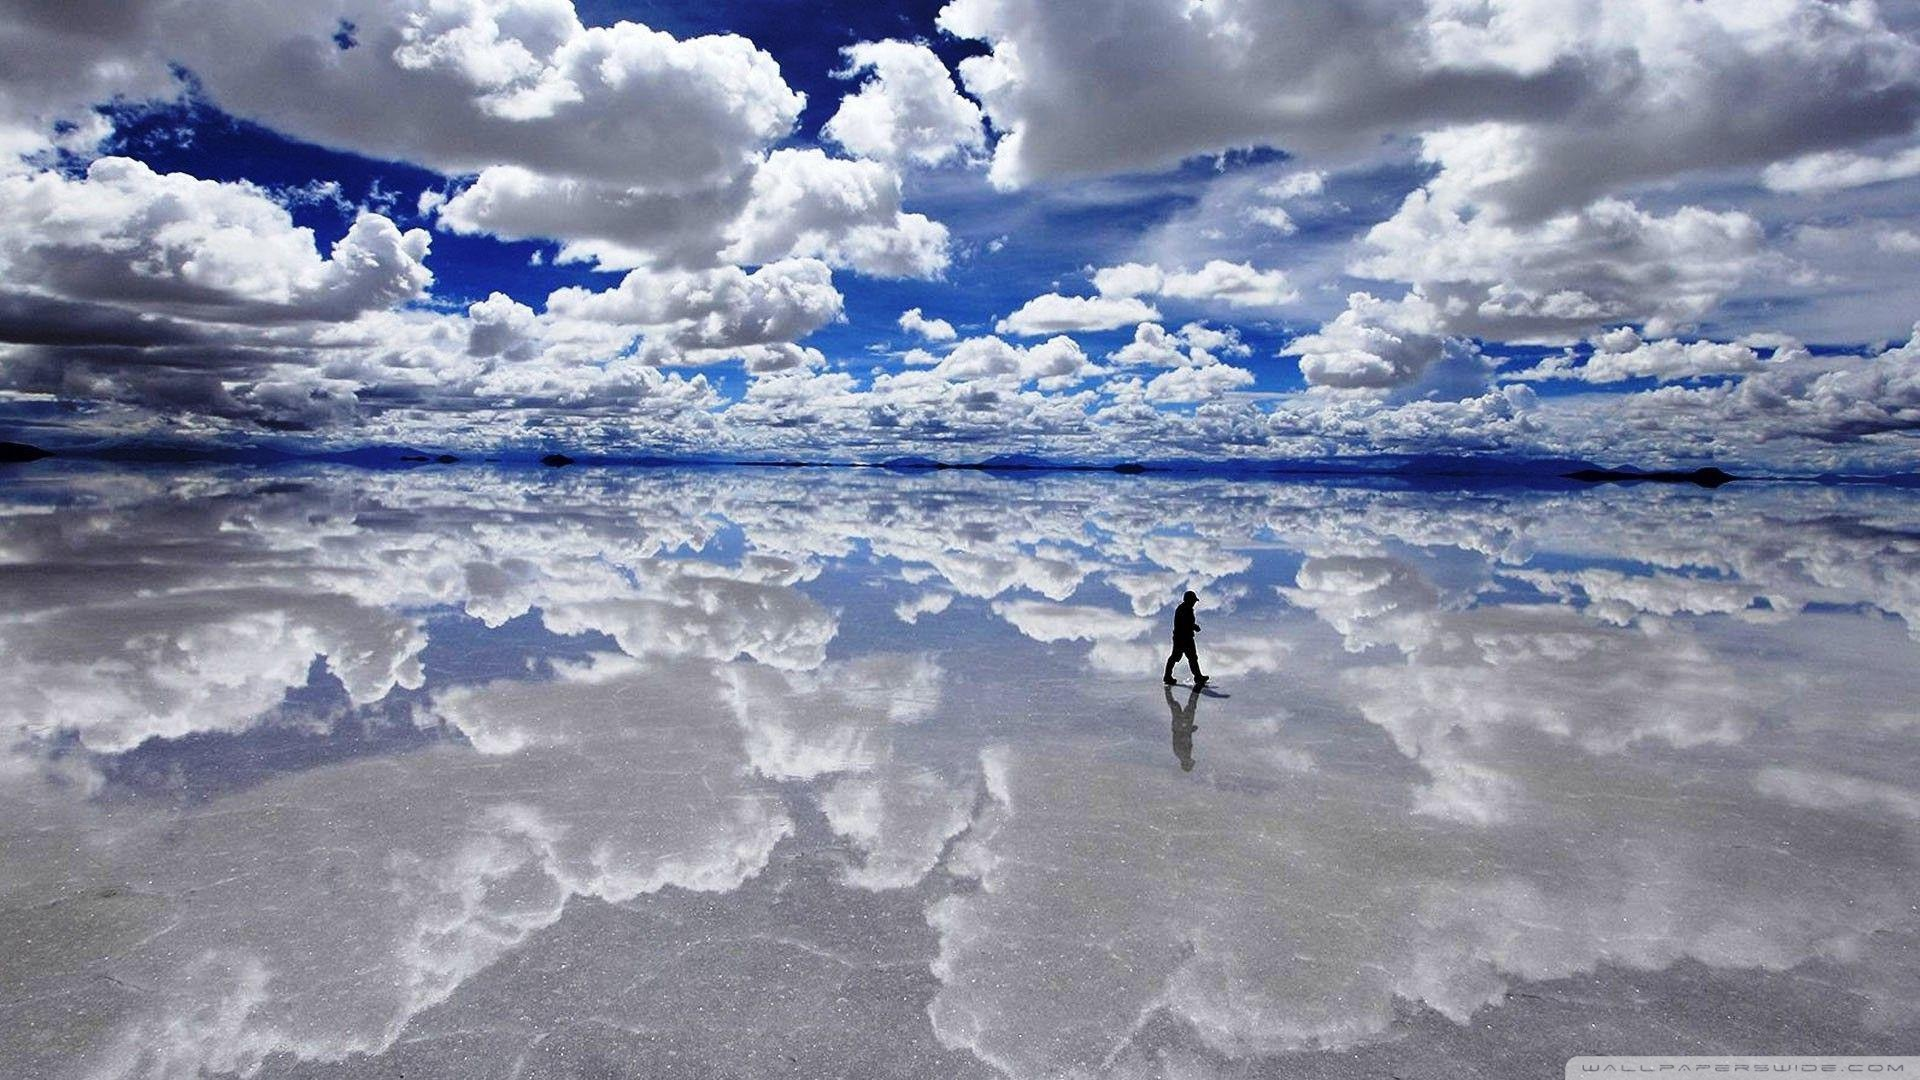 Salar de Uyuni Bolivia 4K HD Desktop Wallpaper for 4K Ultra HD 1920x1080